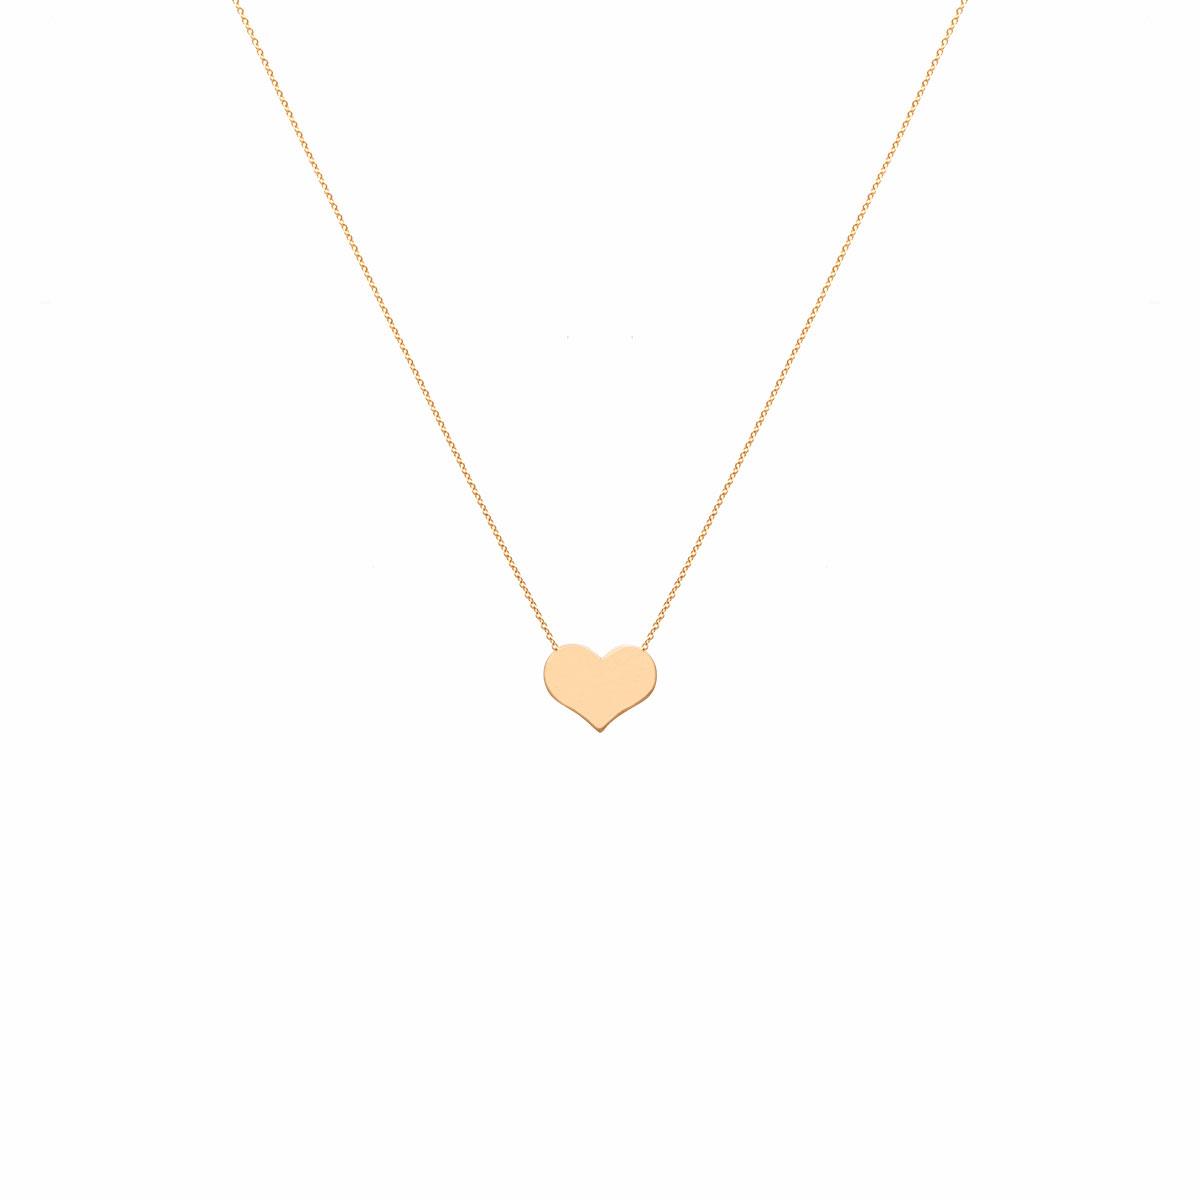 گردنبند طلا قلب کوچک